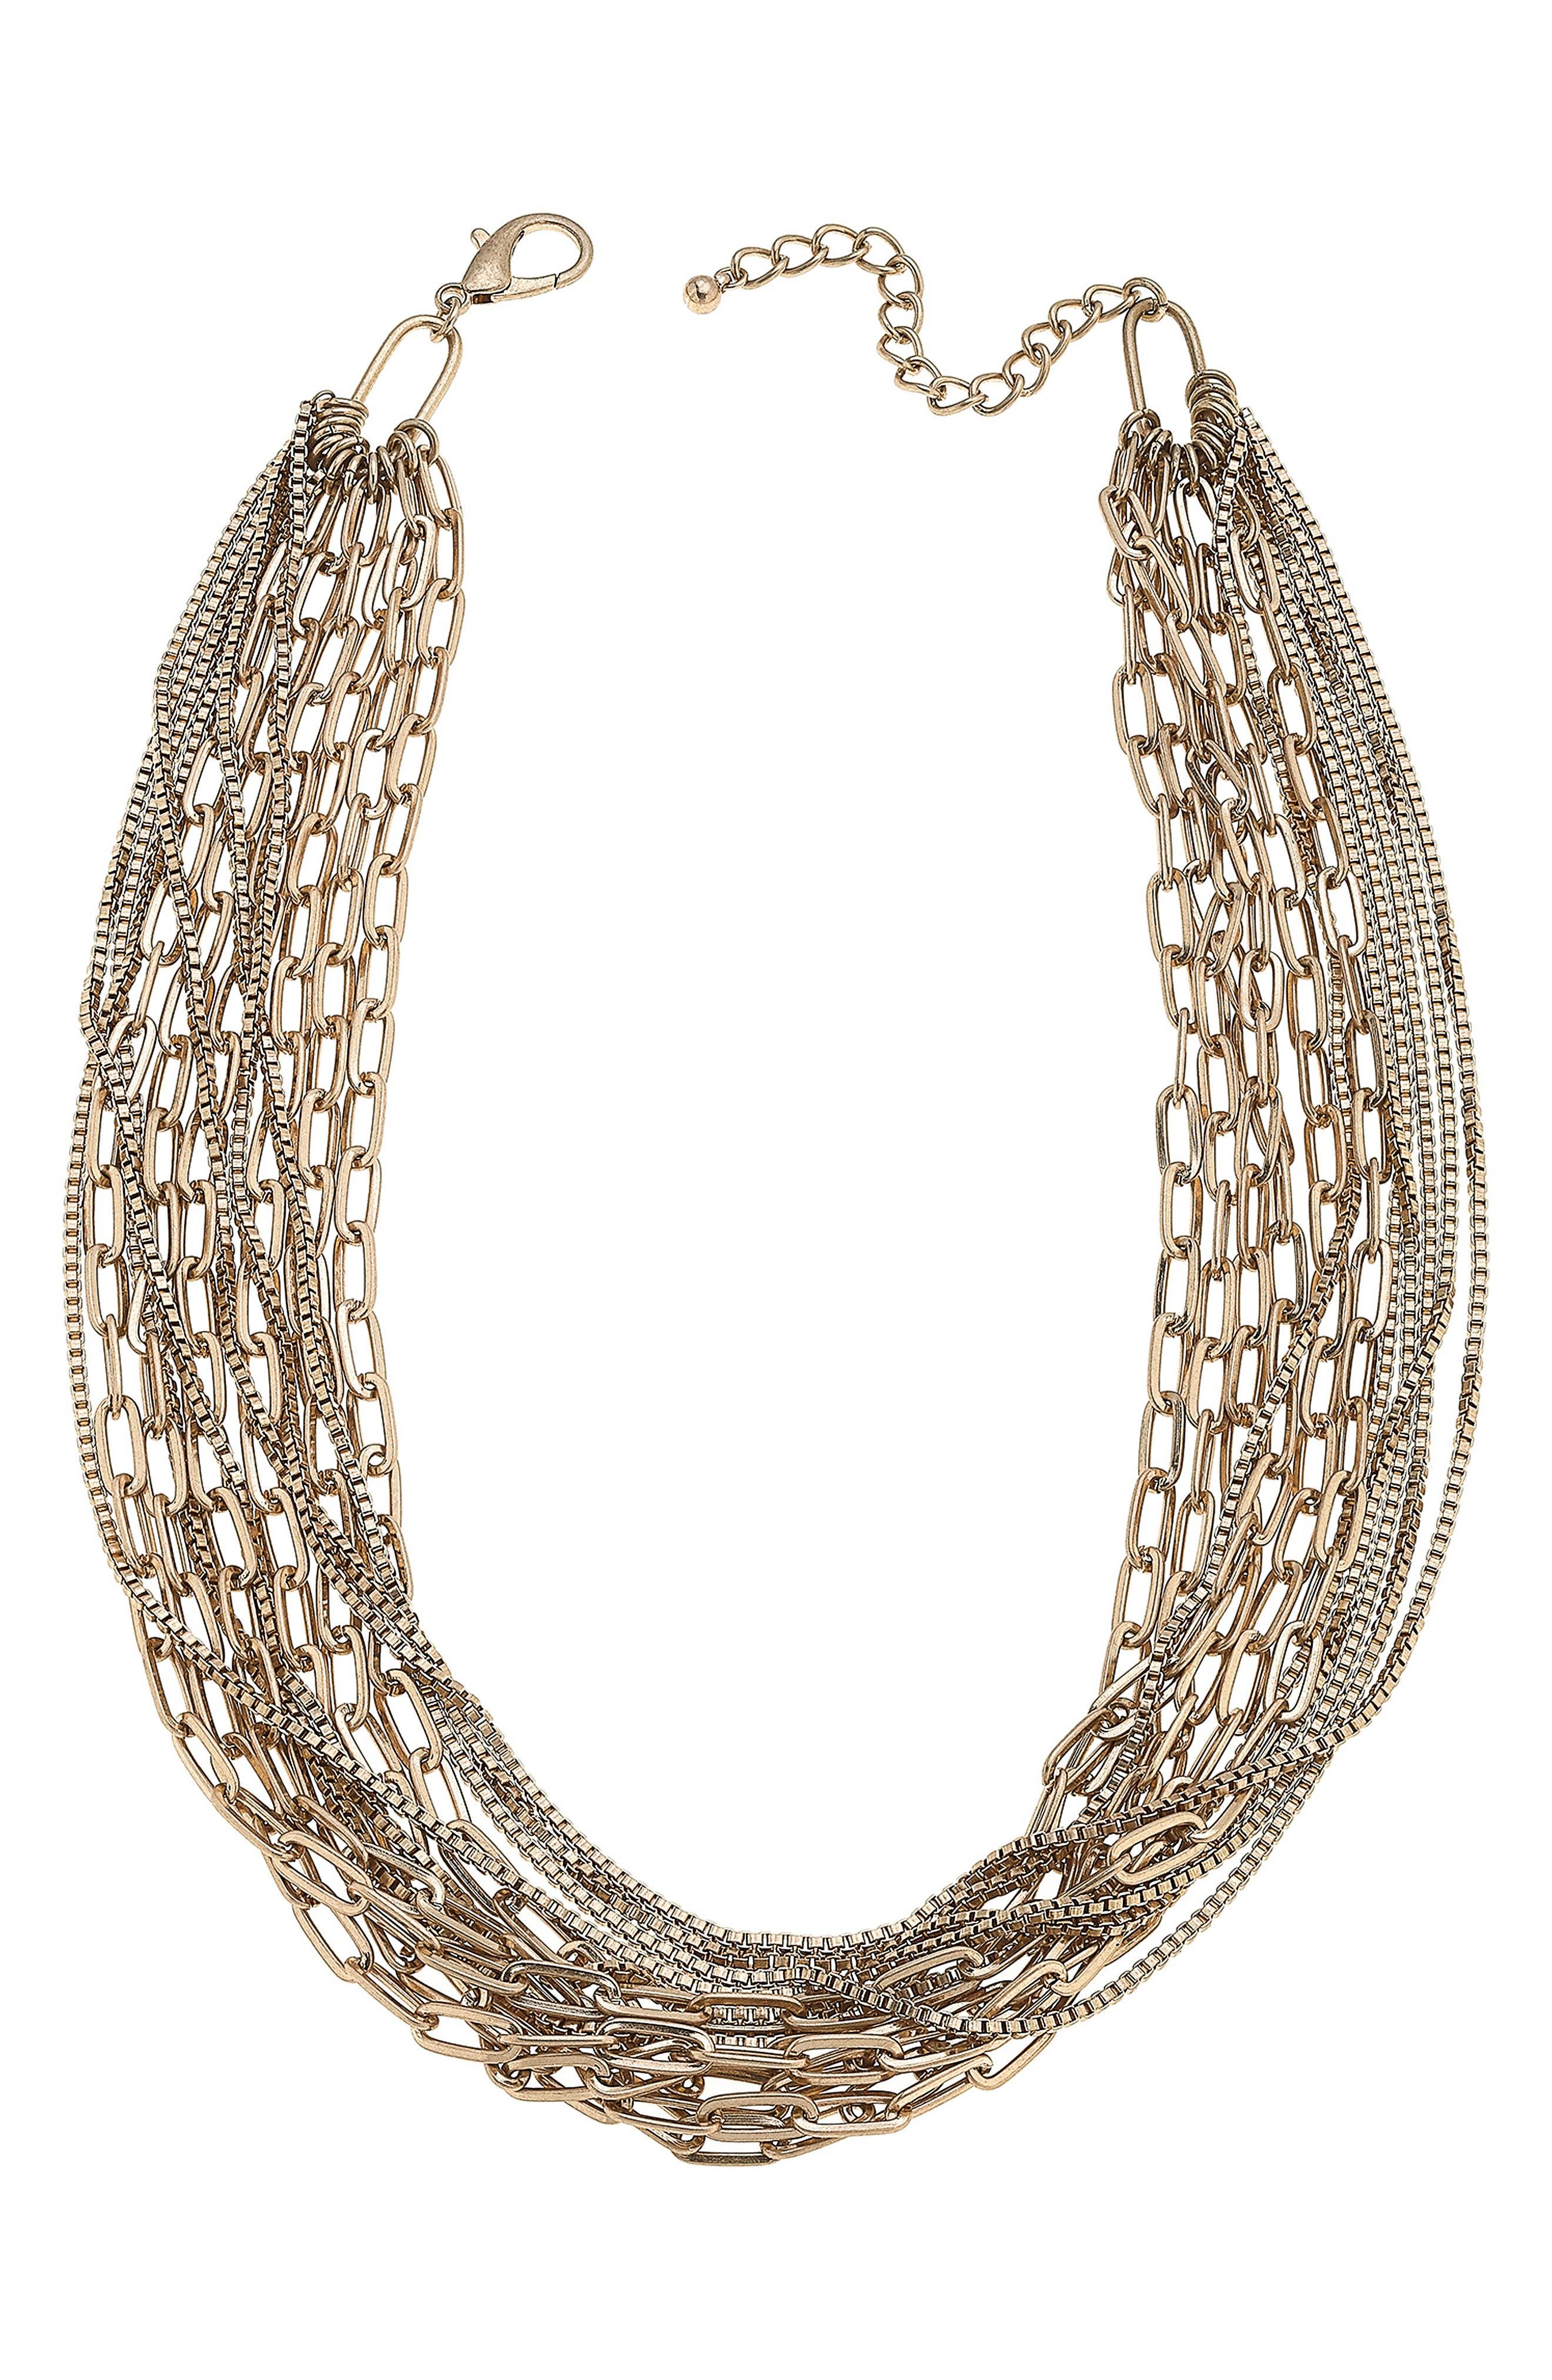 Soren Layered Chain Necklace